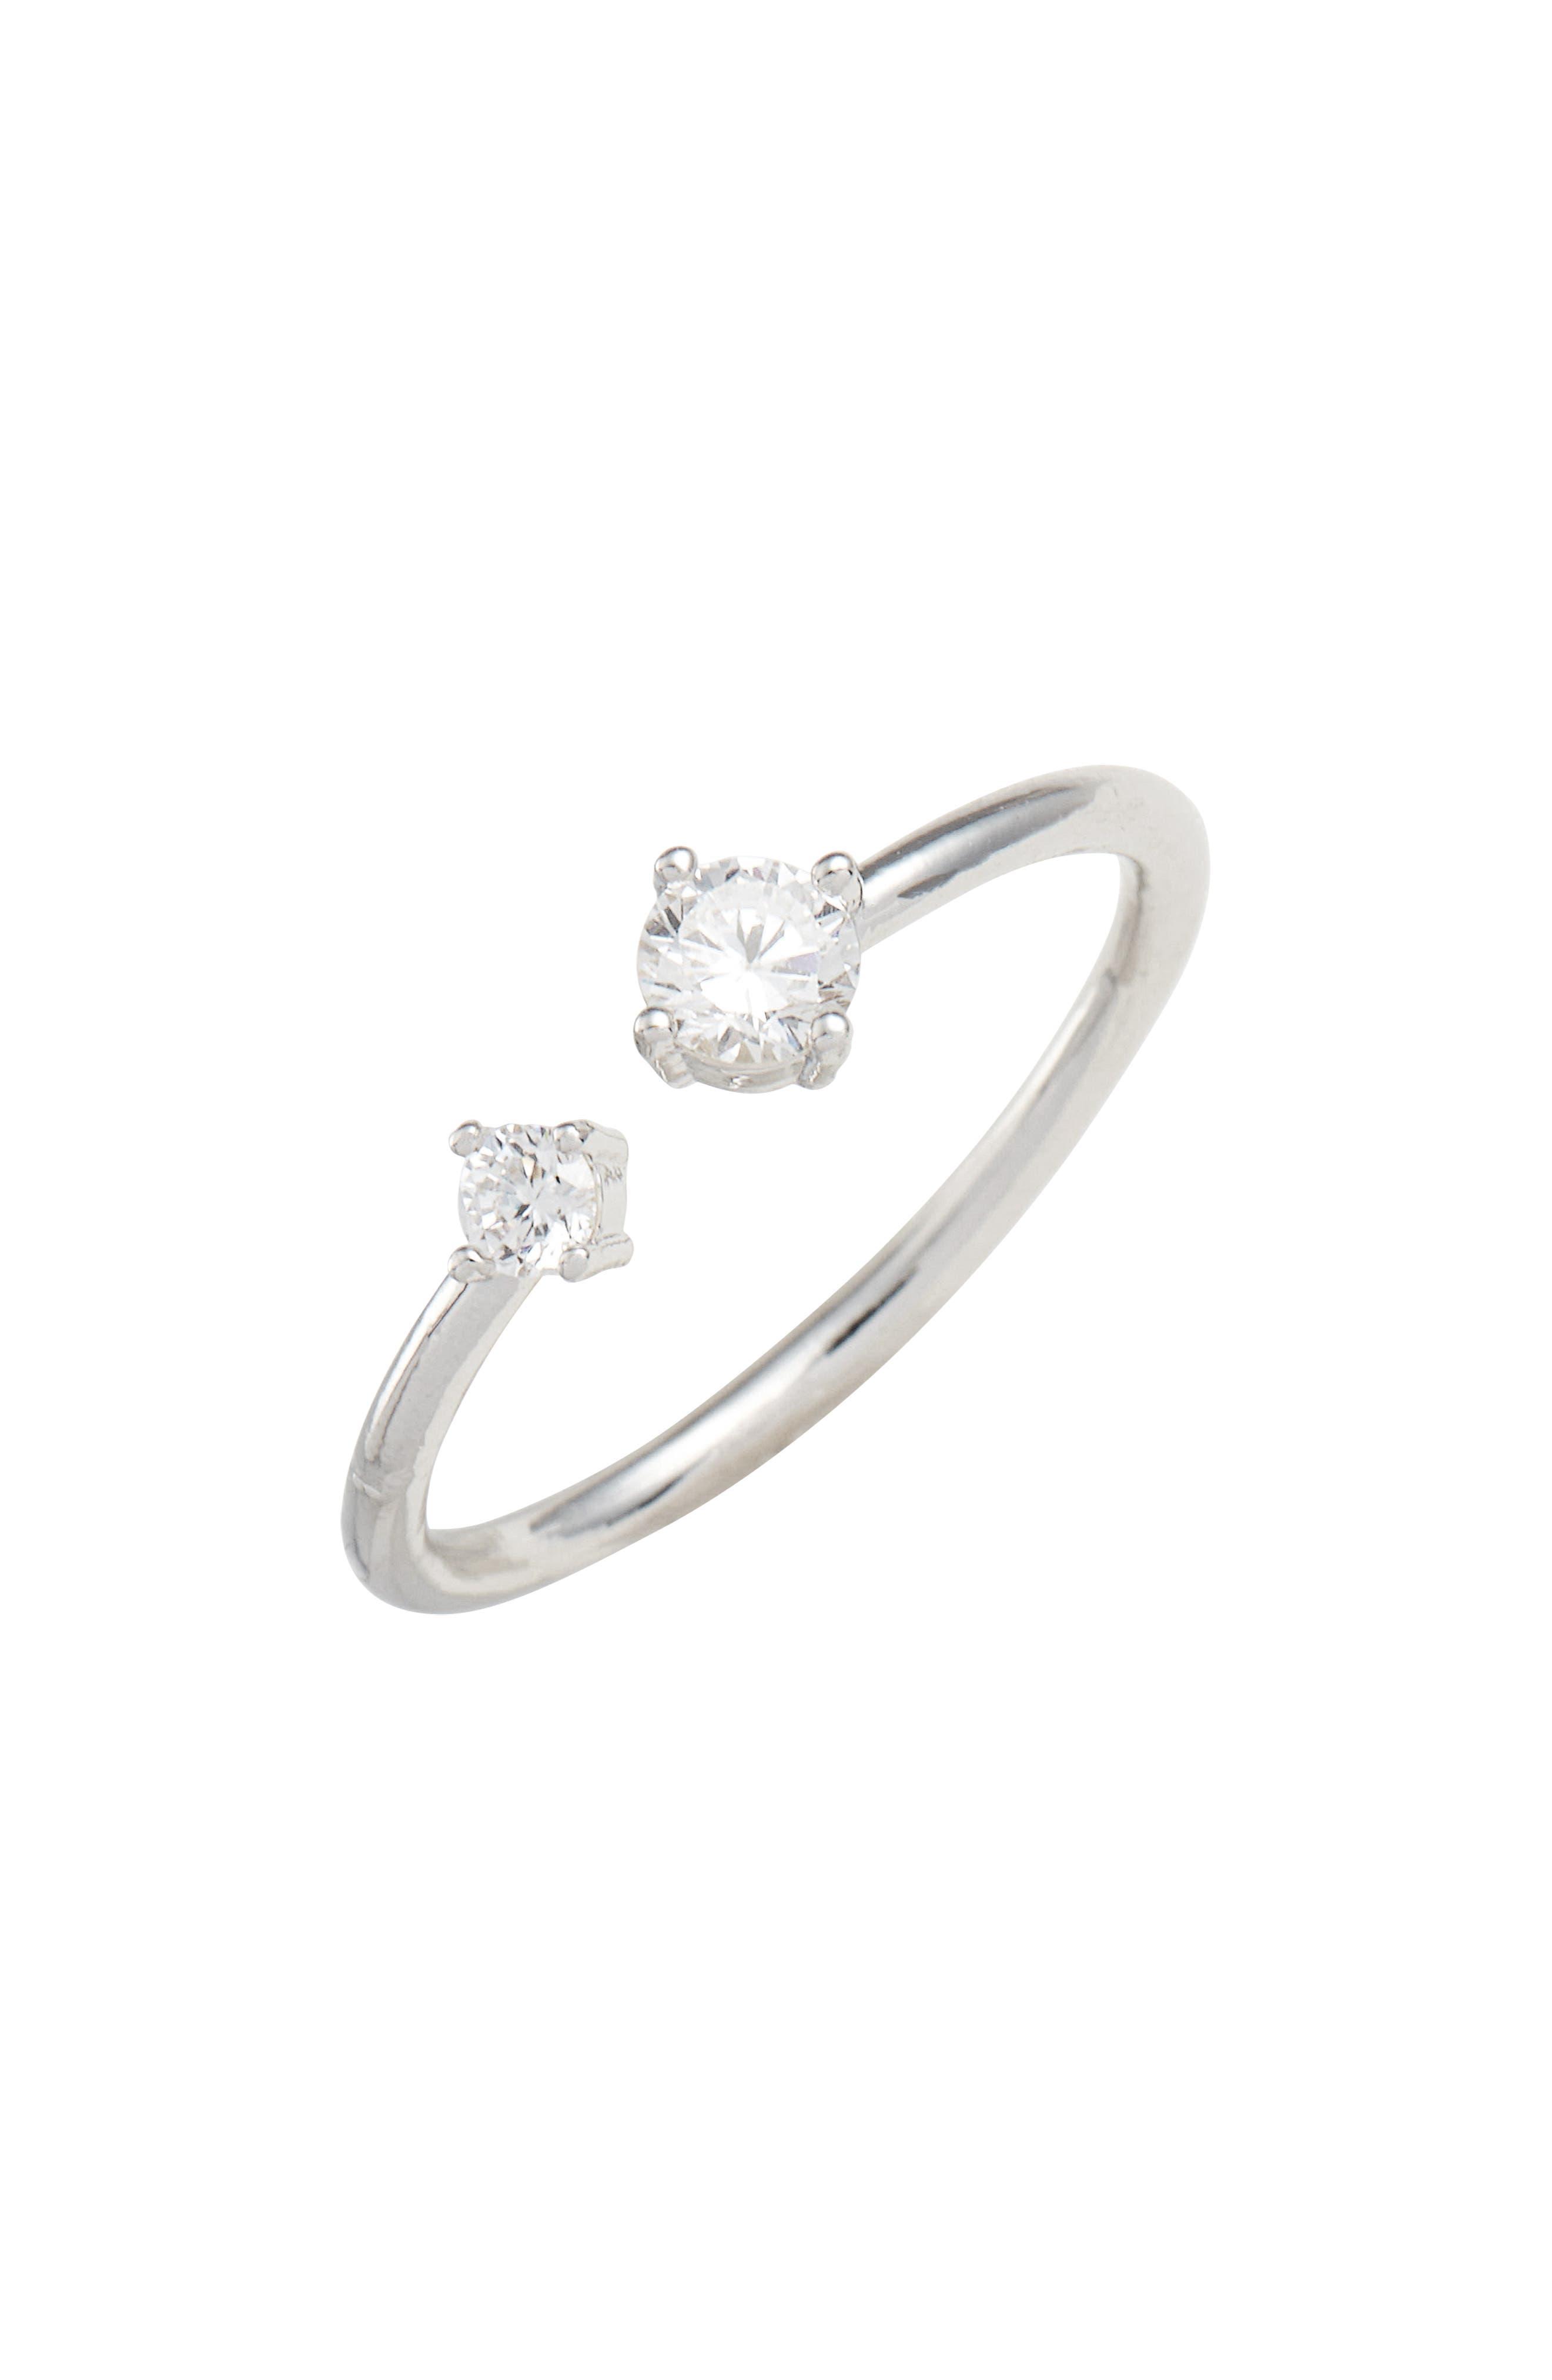 Briane Stackable Ring,                             Main thumbnail 1, color,                             040